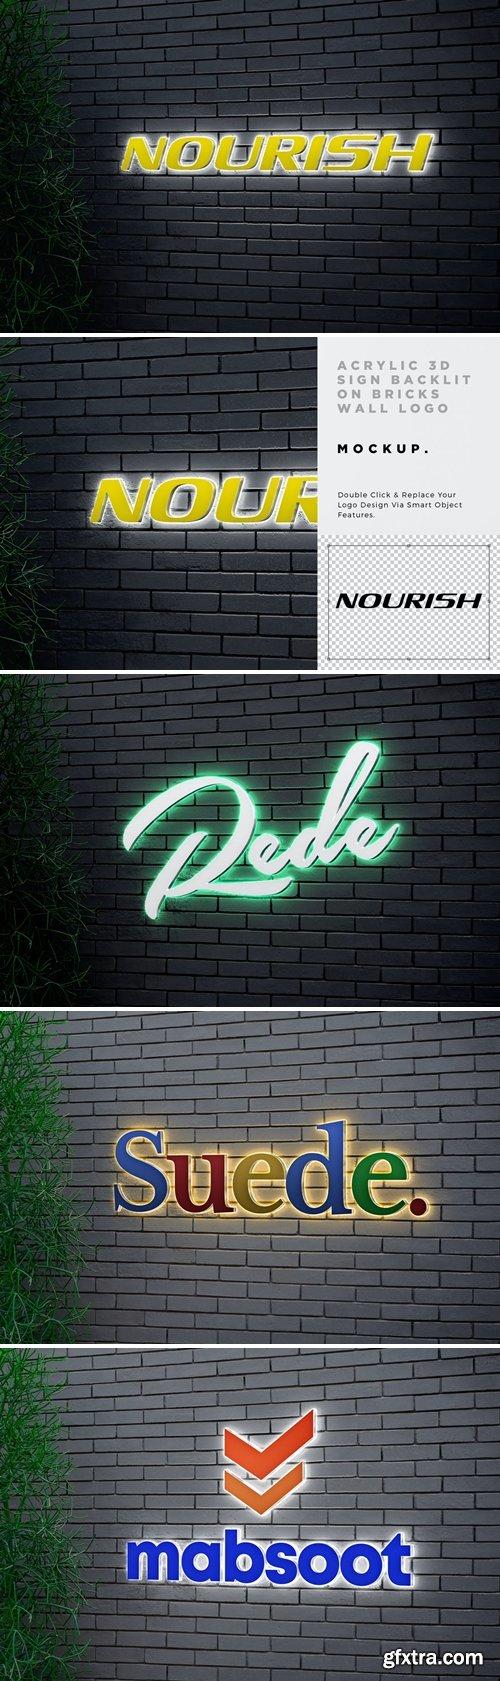 Acrylic 3D Sign Backlit Logo Mockup